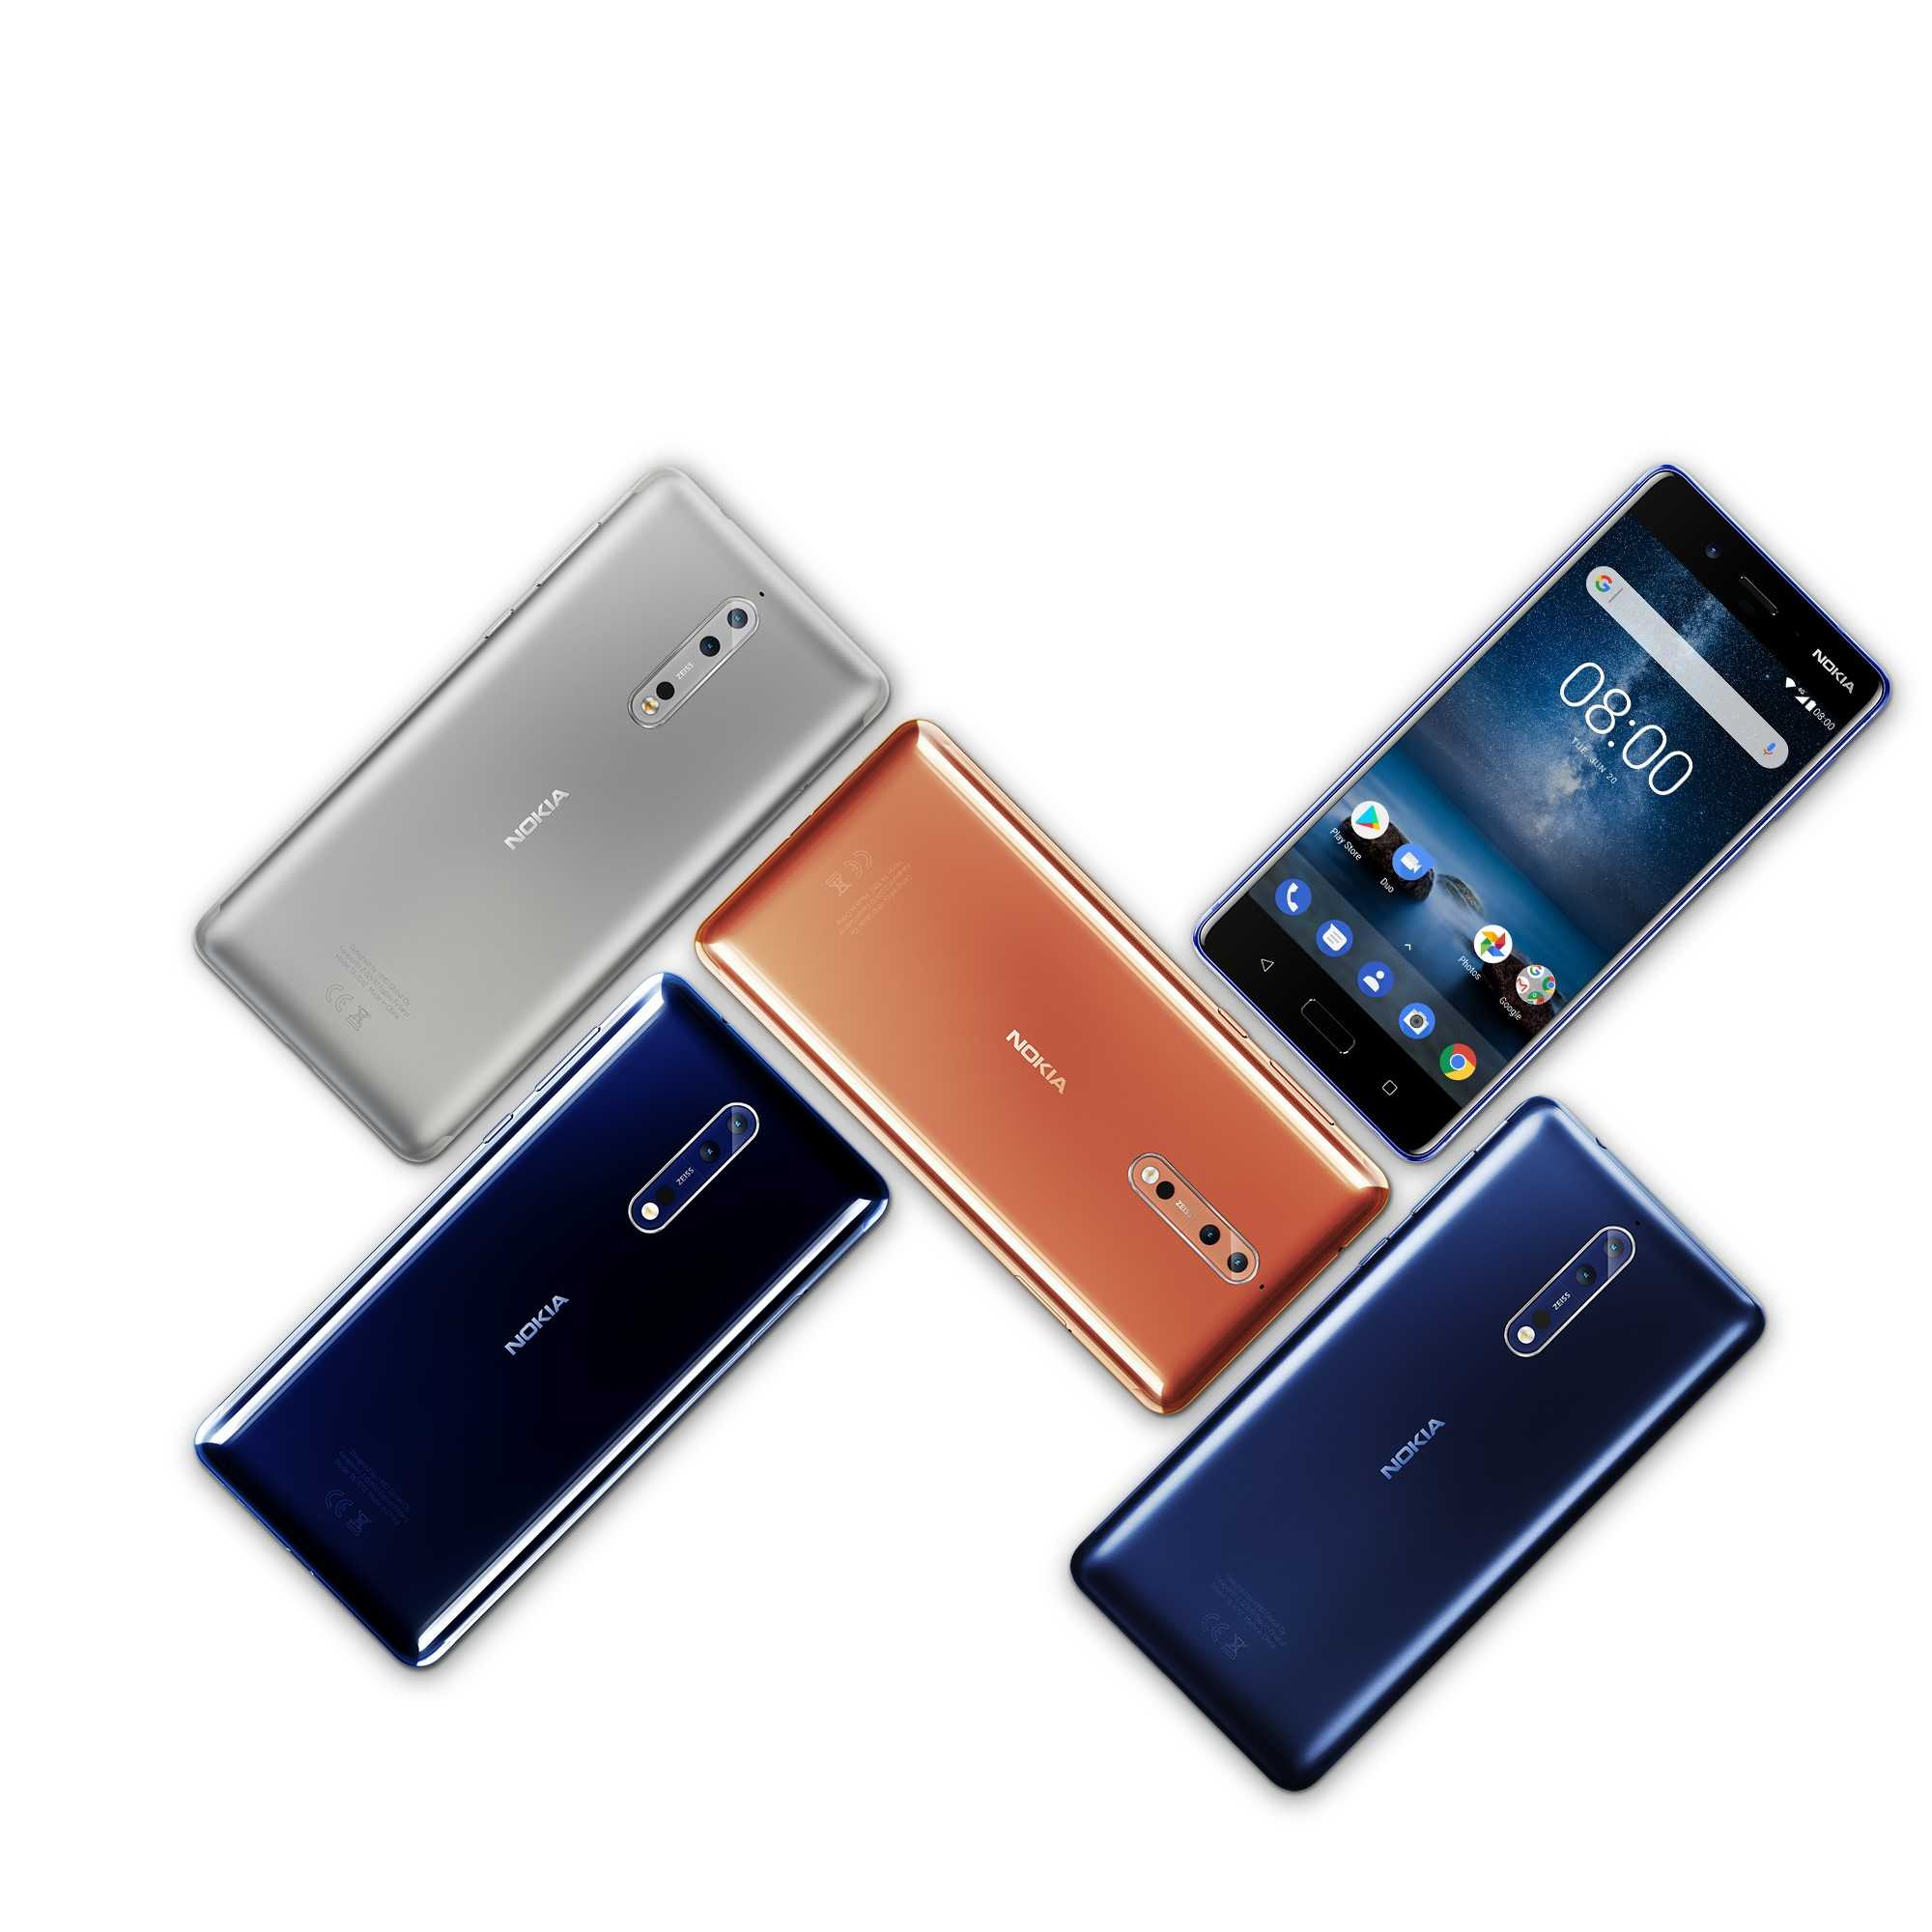 Nokia - Android 8 Oreo für alle Modelle, inklusive dem Nokia 3